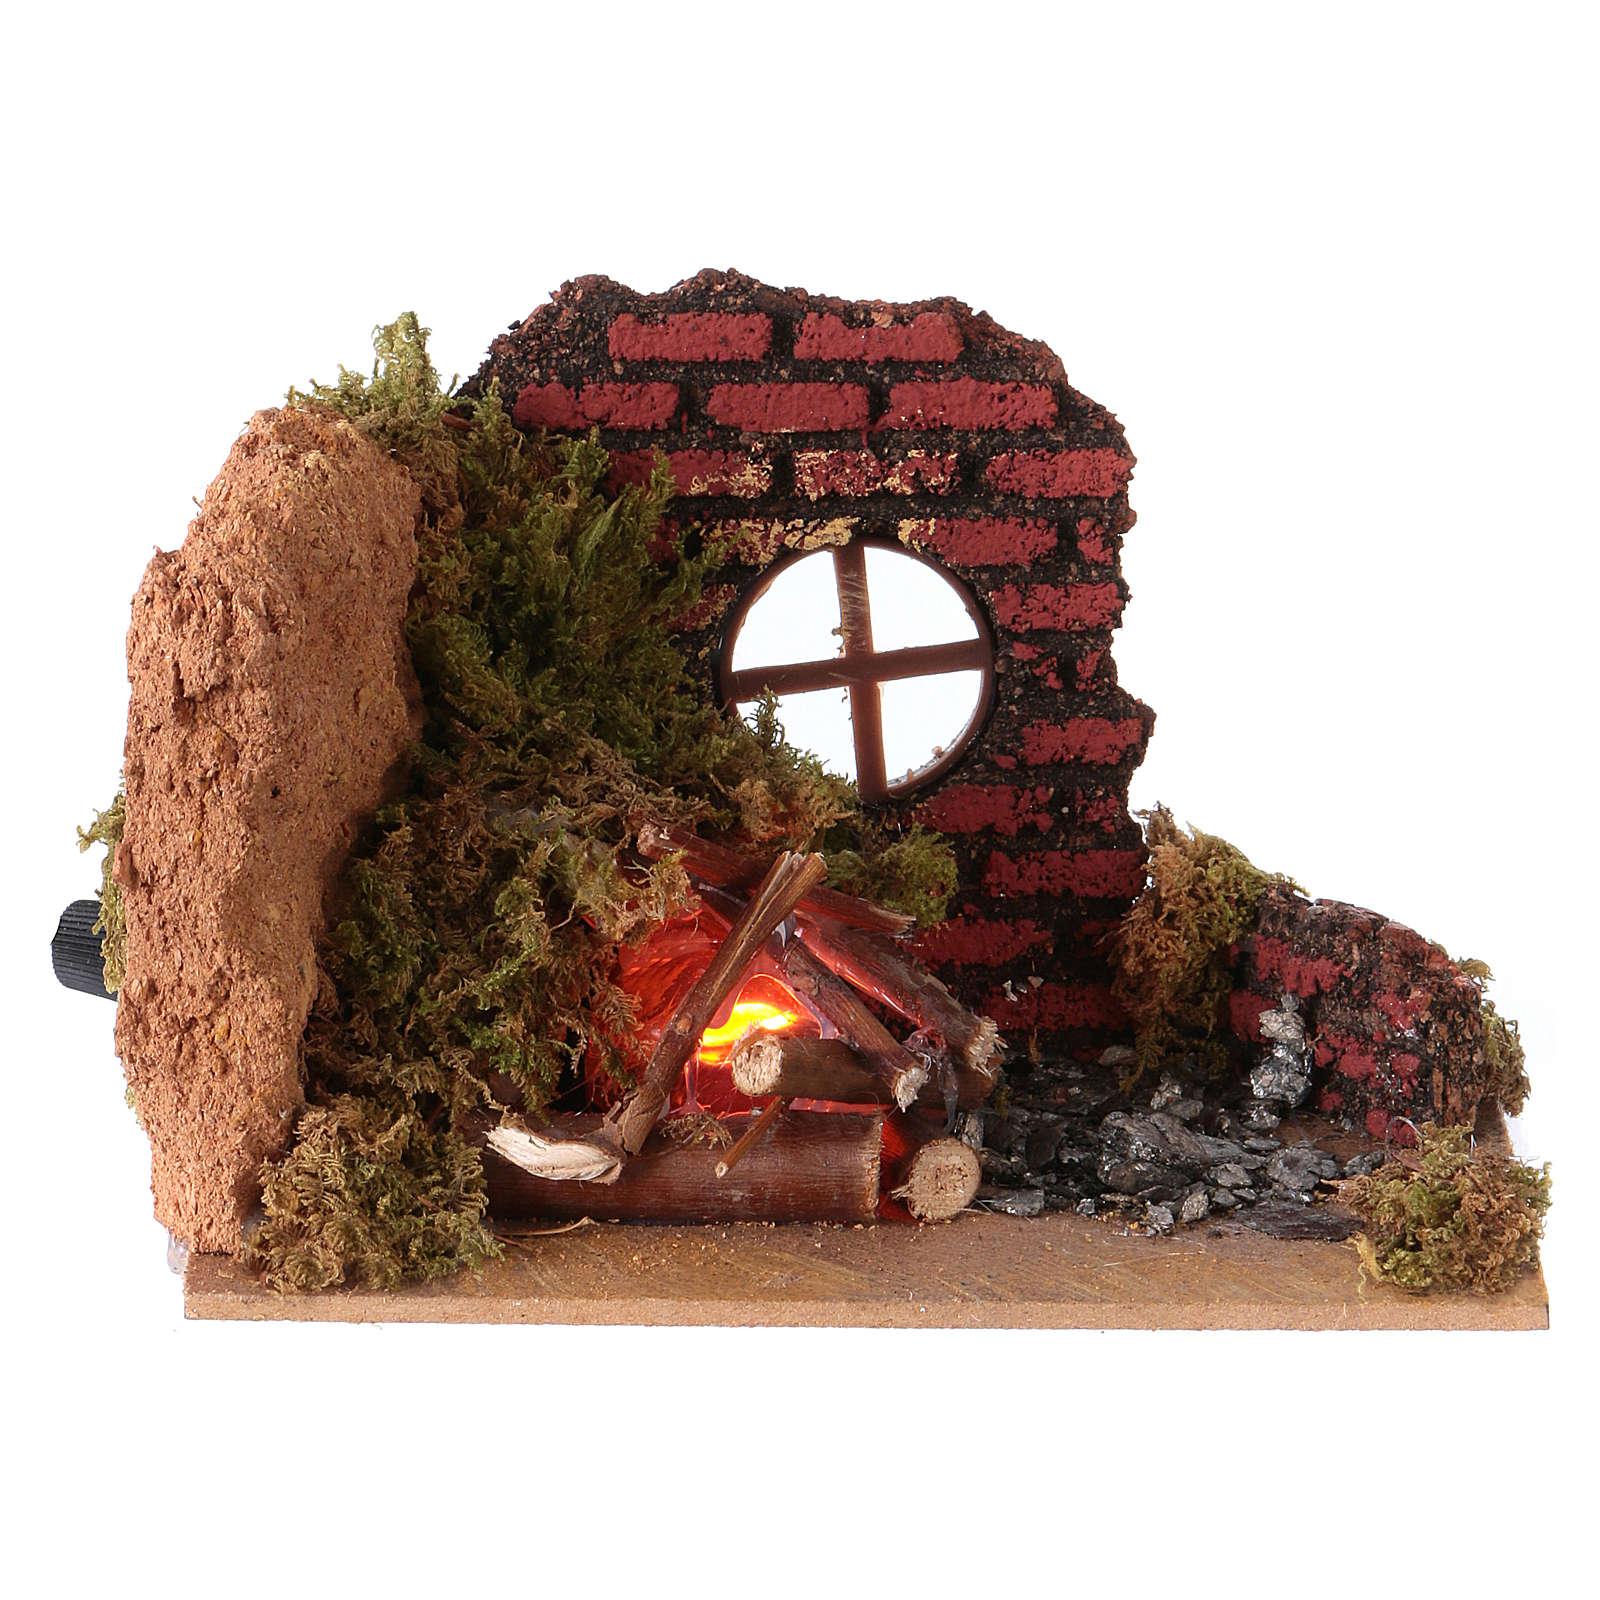 Nativity fire flame effect lamp 15x10 4